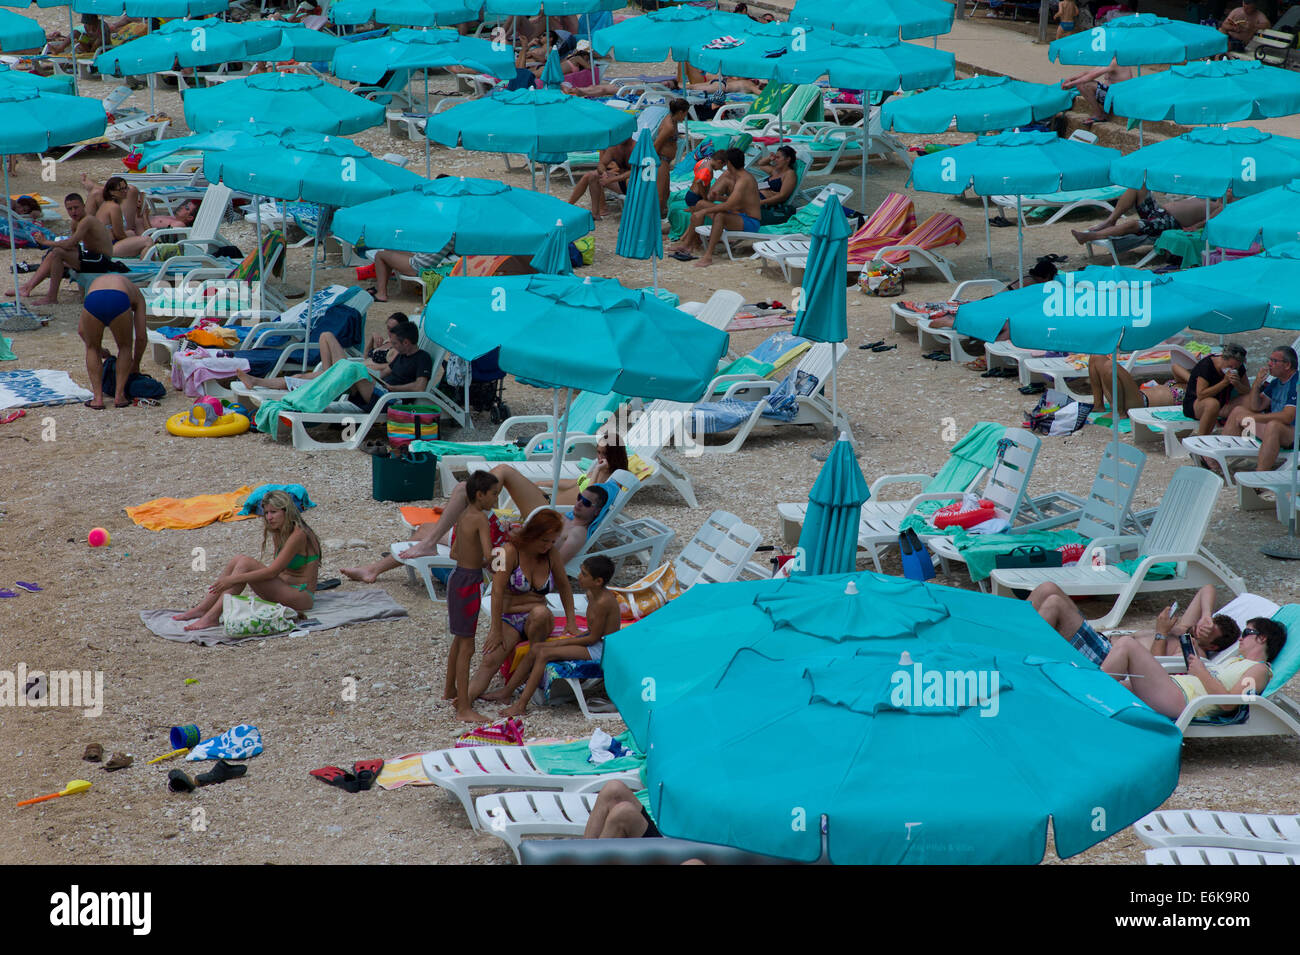 Veli Zal (blaue Flagge) Strand Mali Losinj, Insel Losinj, Kroatien Stockbild